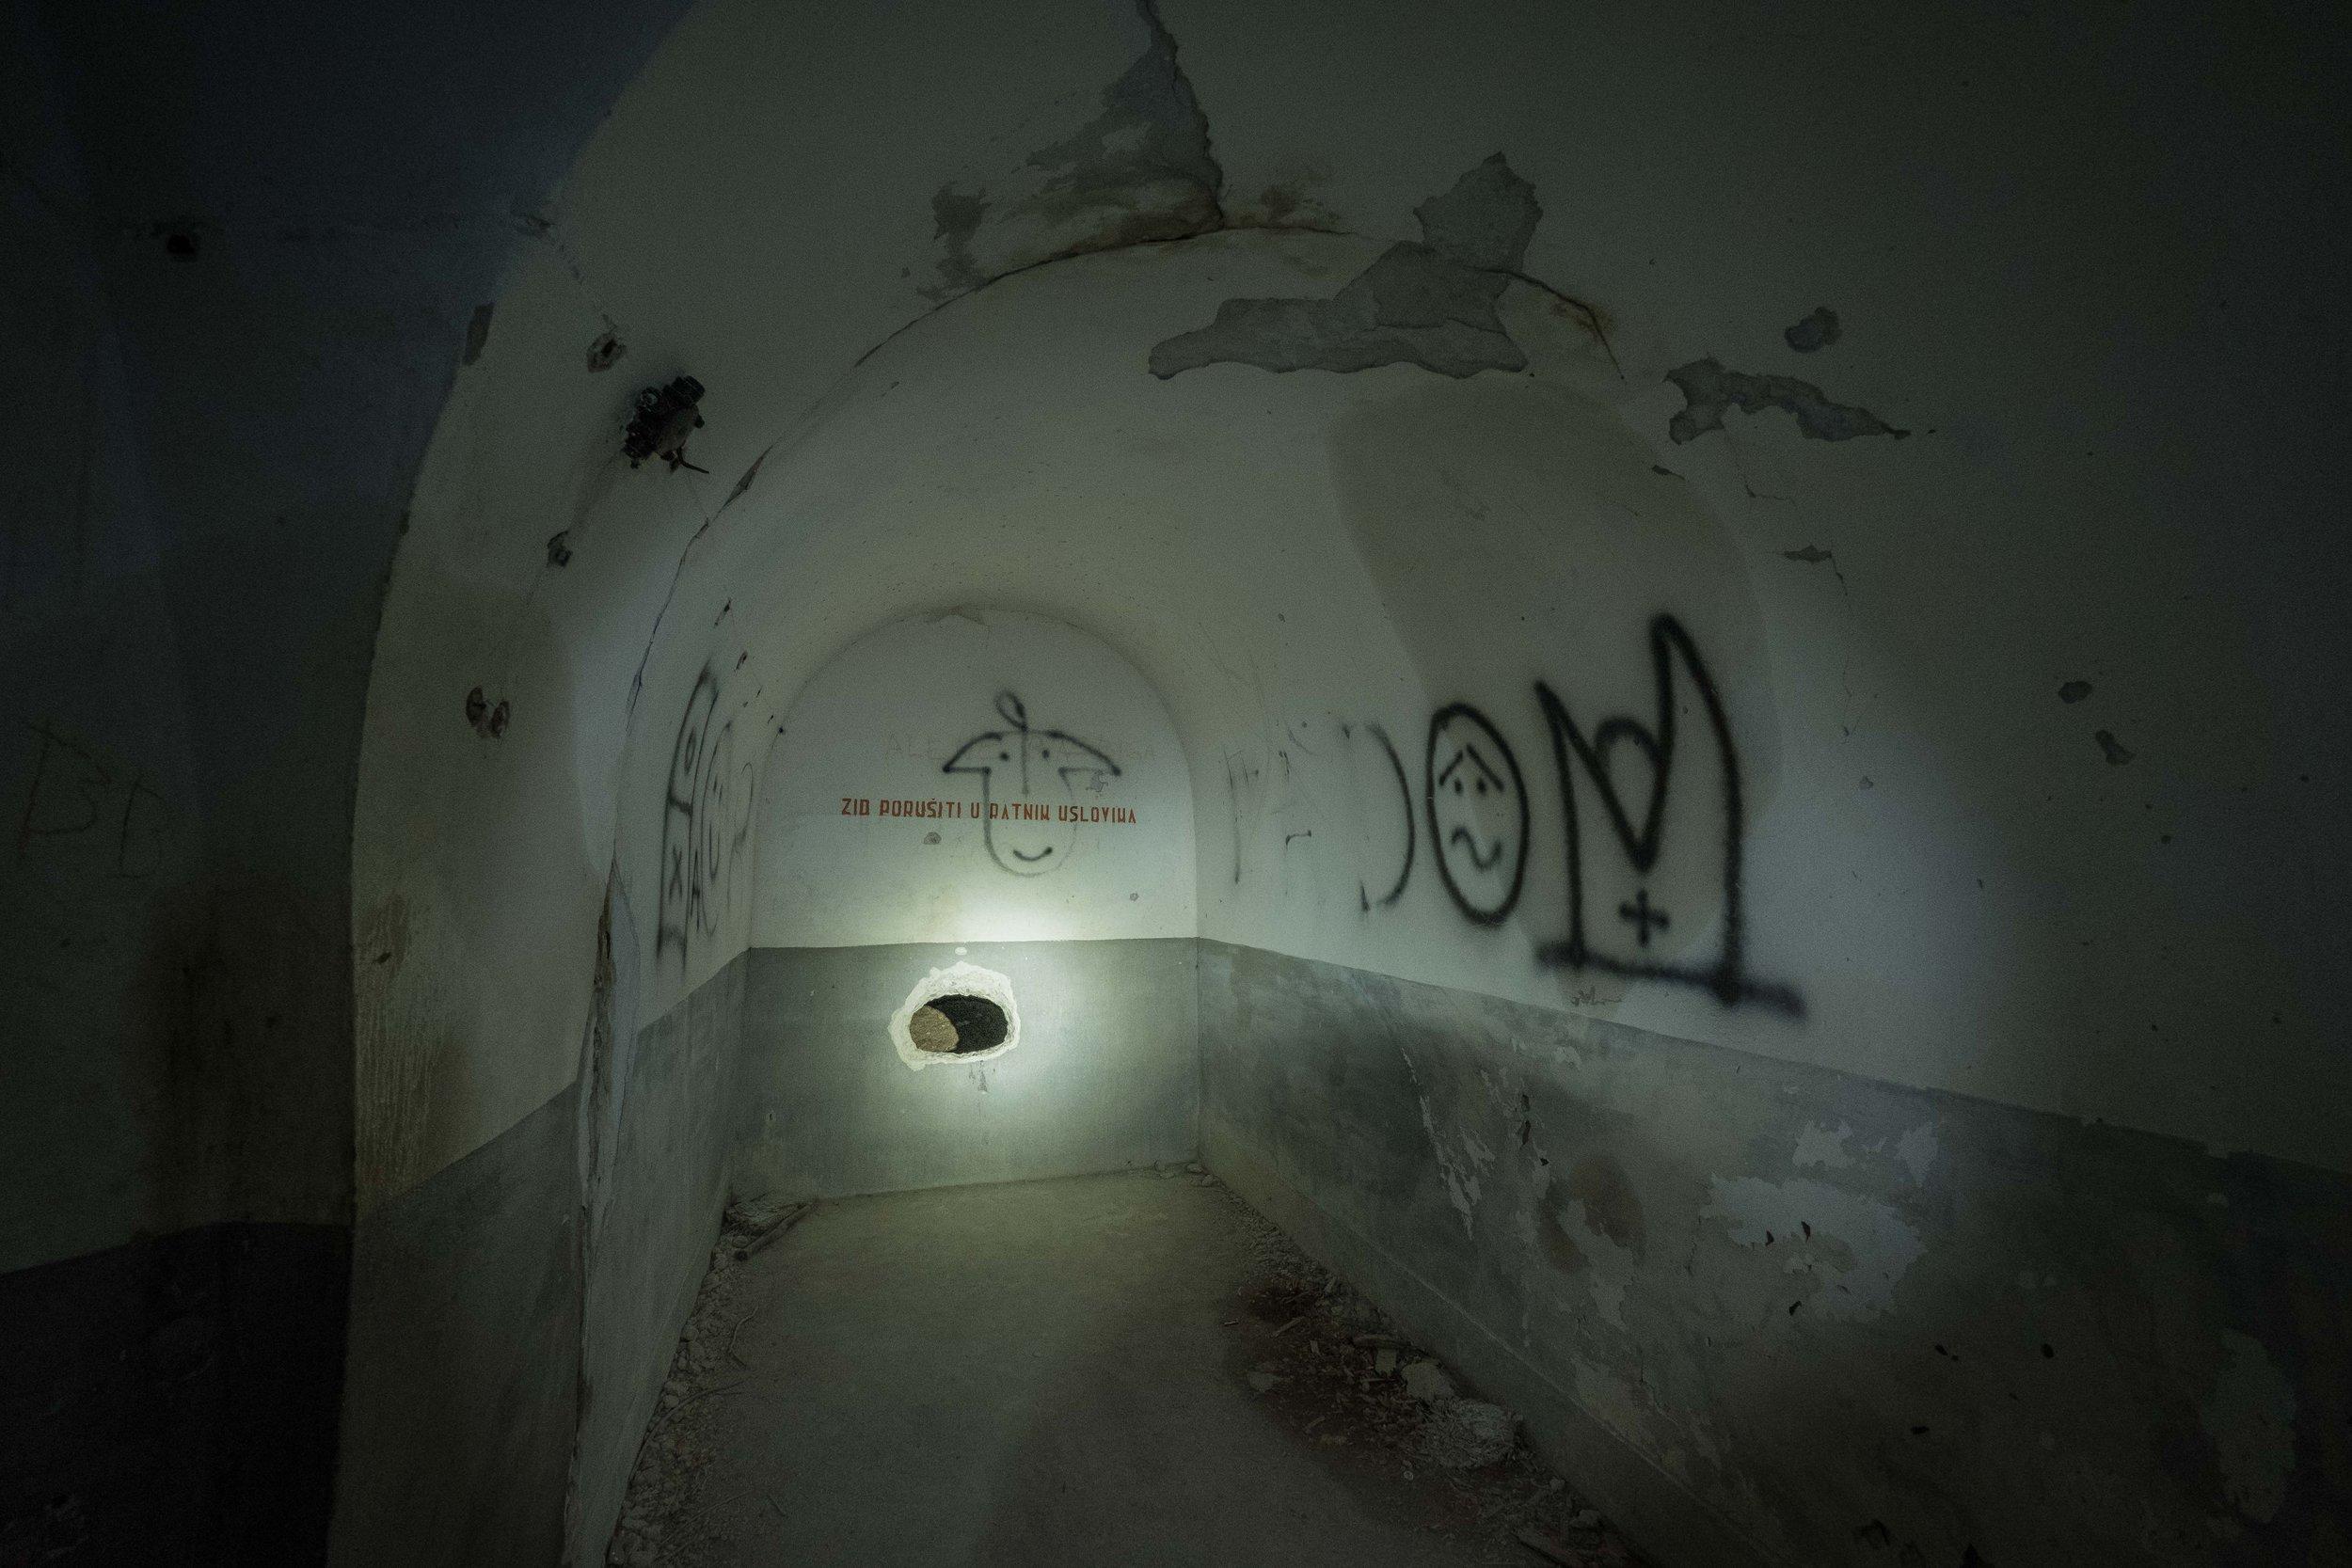 """zid porušiti u ratnim uslovima"" or, roughly translated, ""break wall in case of war""; behind the plaster was a crude tunnel out"